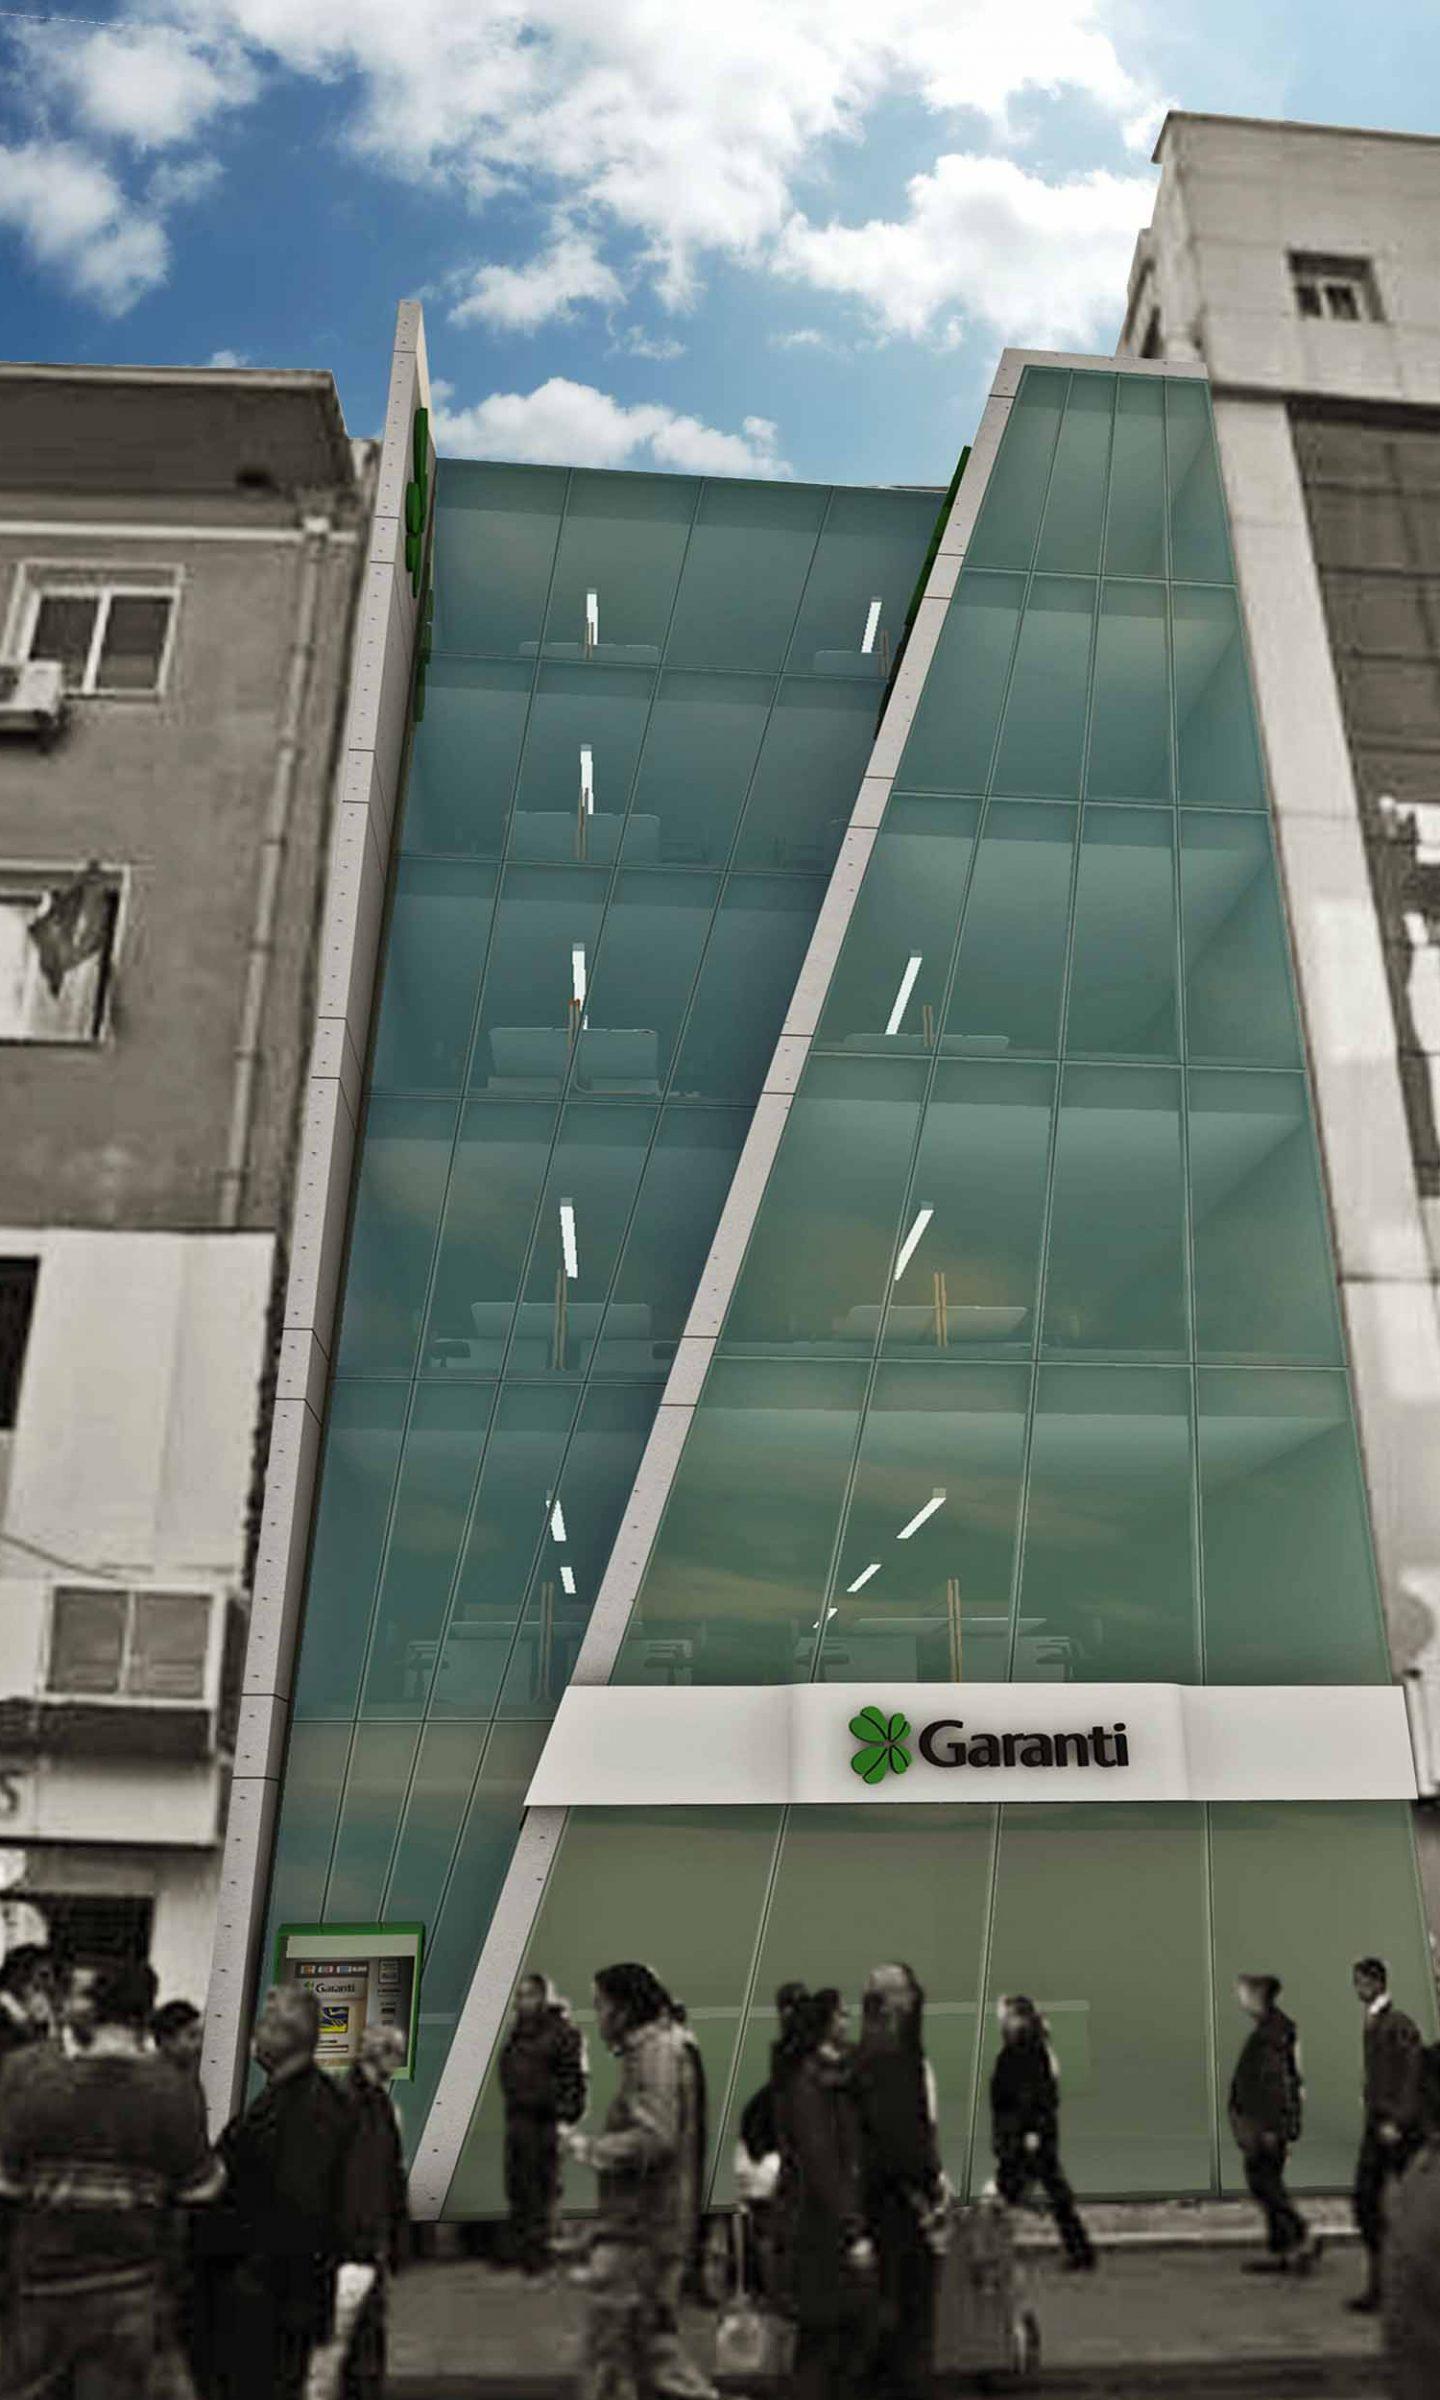 Garanti Bank Branch